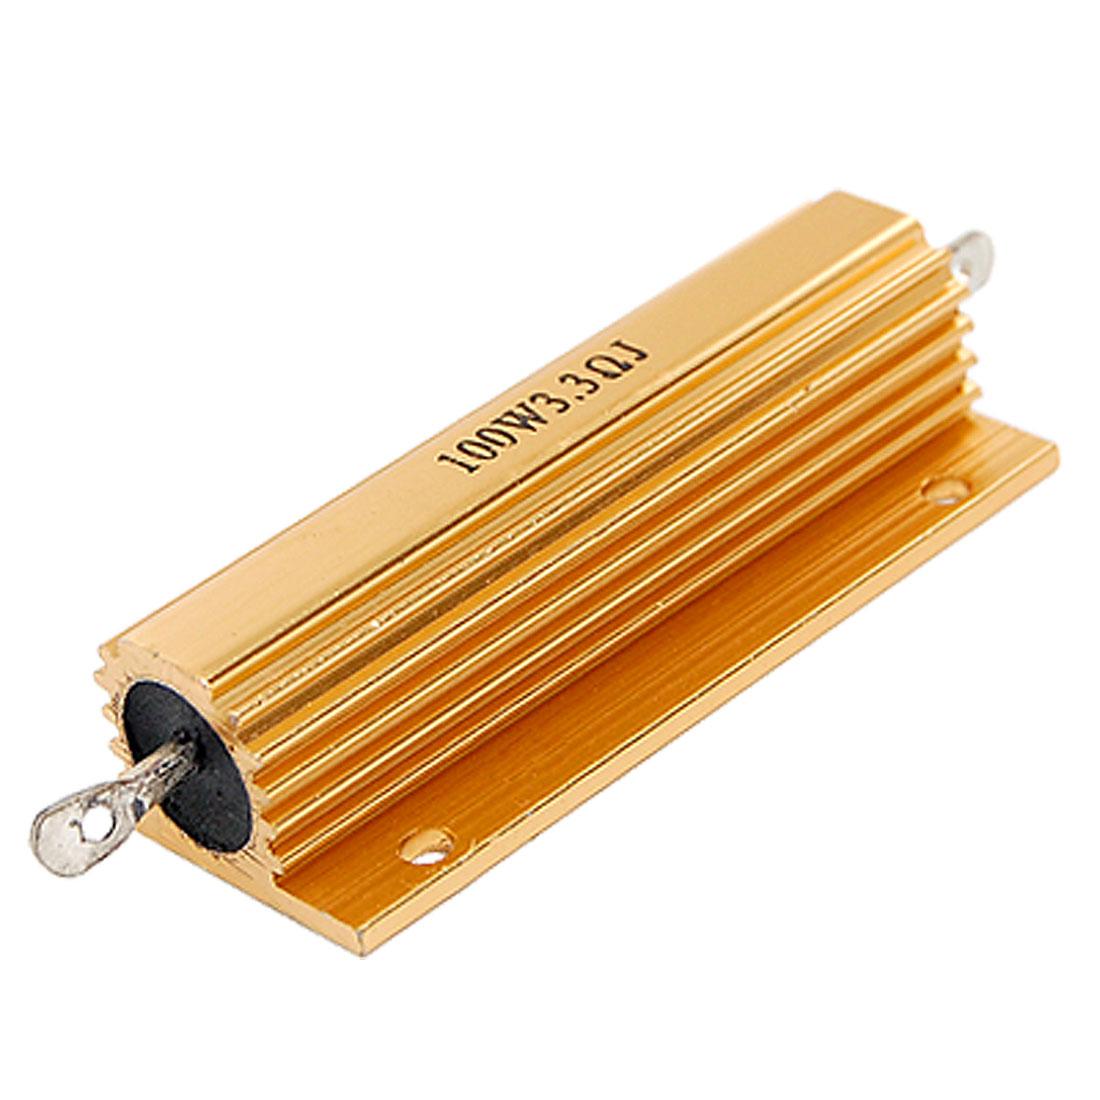 100Watt 5% 3.3 Ohm Resistance Gold Tone Aluminum Case Resistor